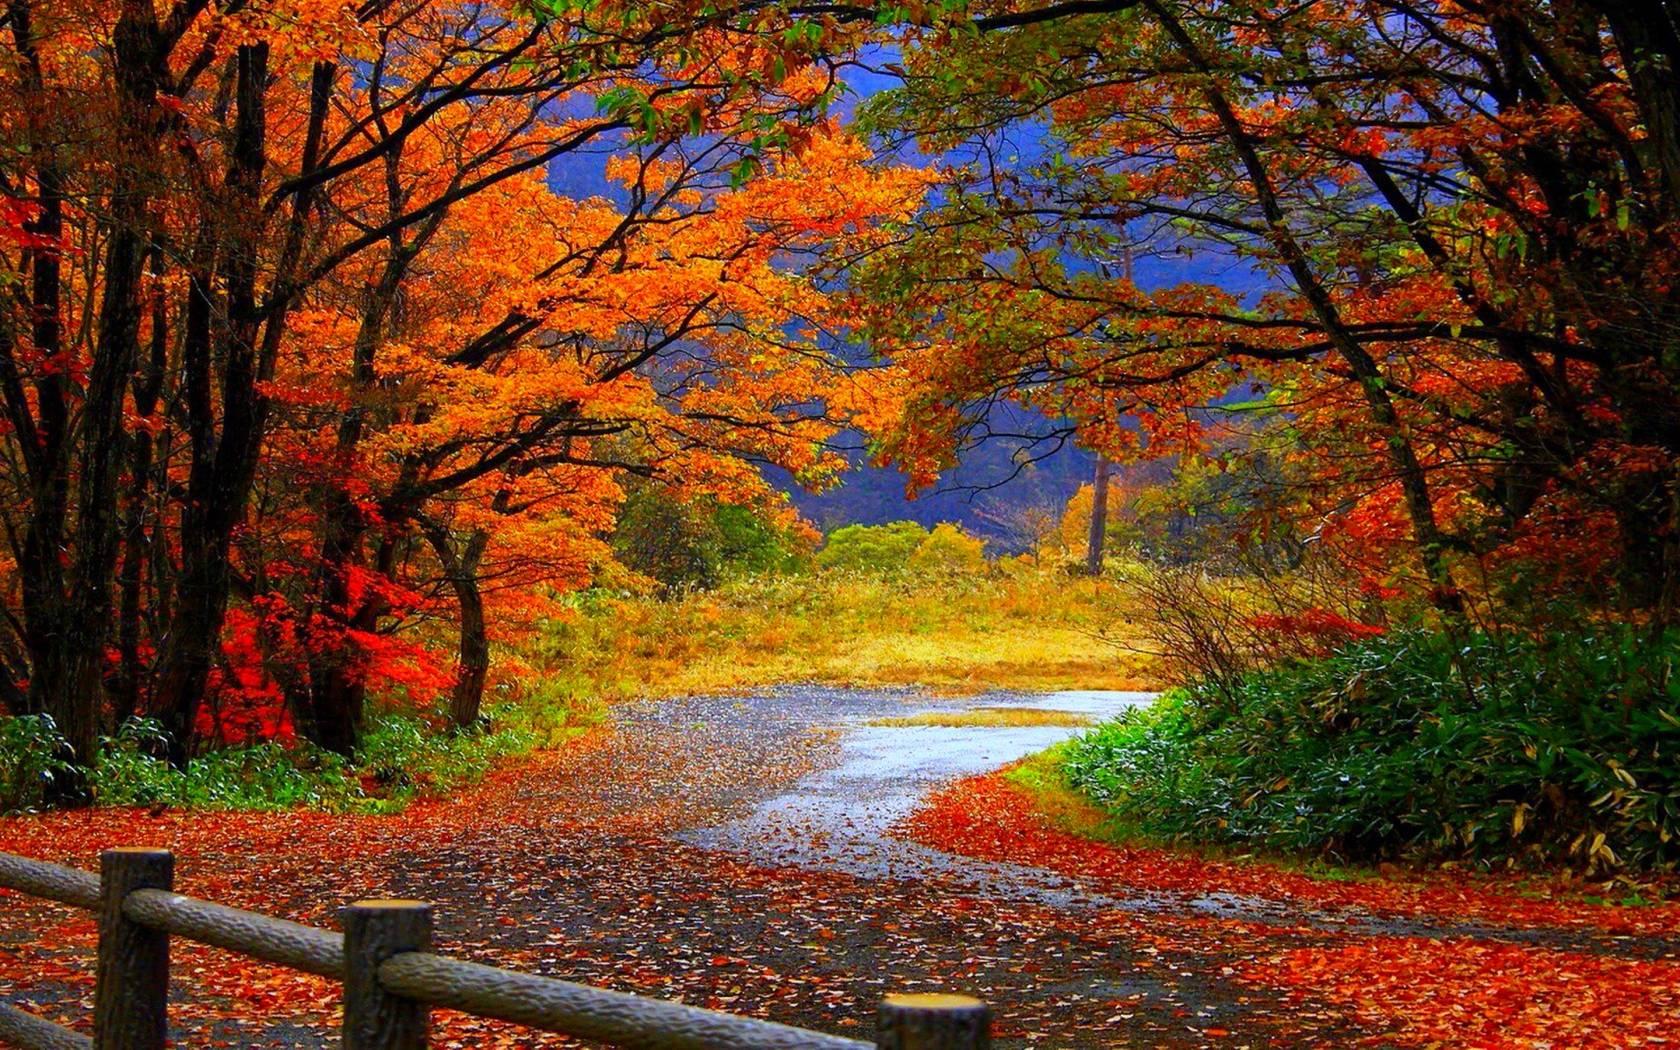 Hd Autumn Wallpapers Inn